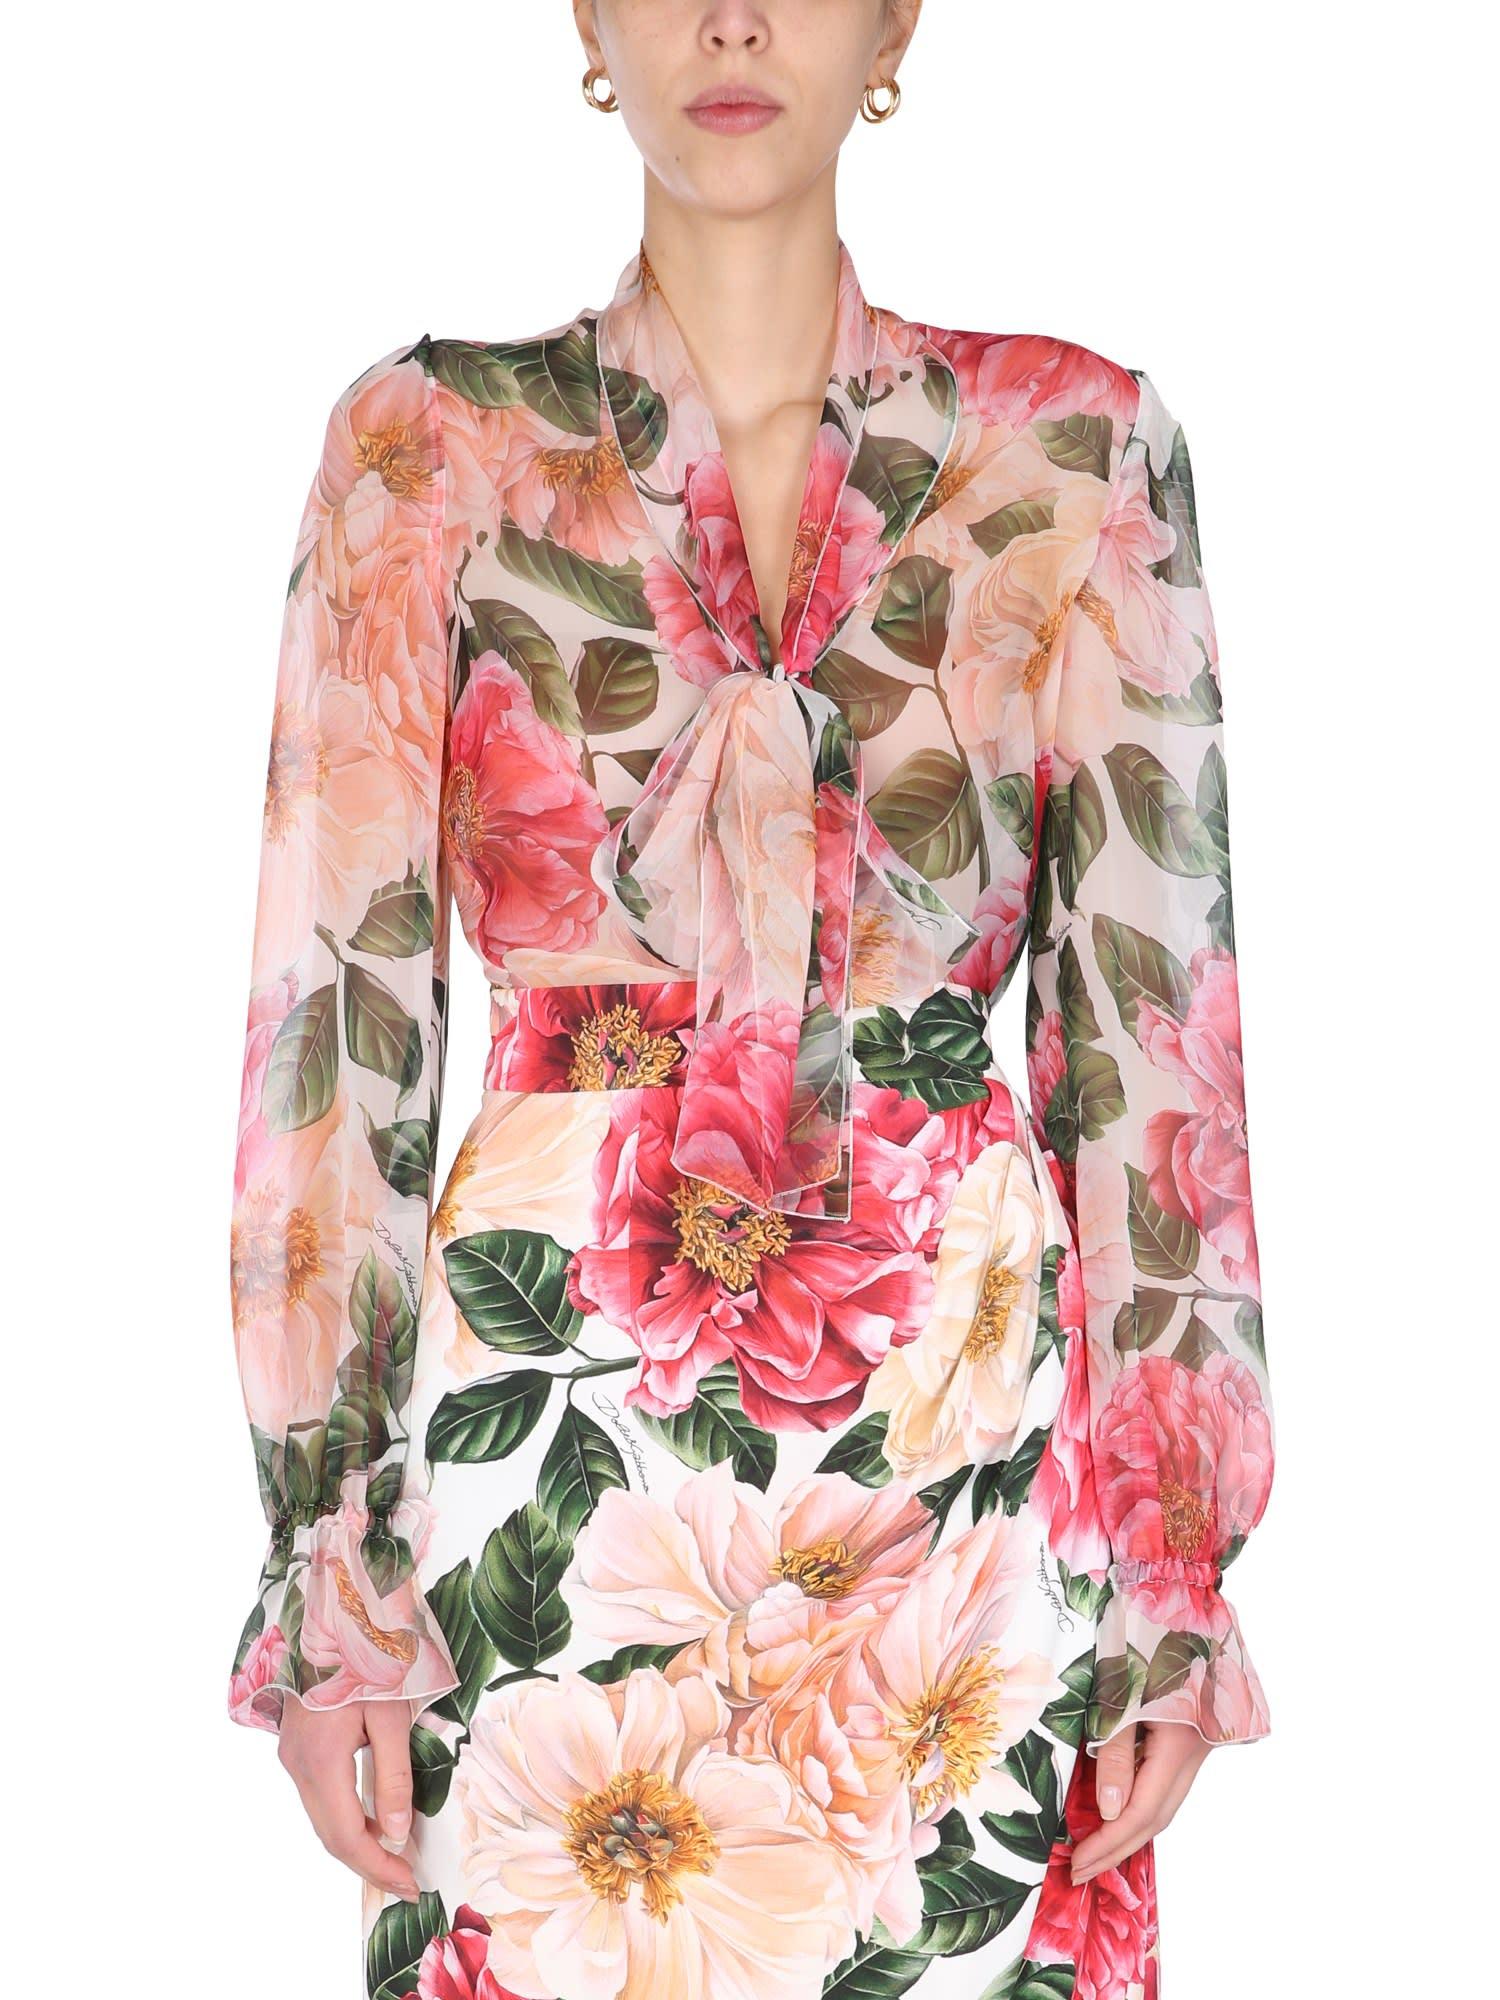 Dolce & Gabbana Camellia Print Shirt